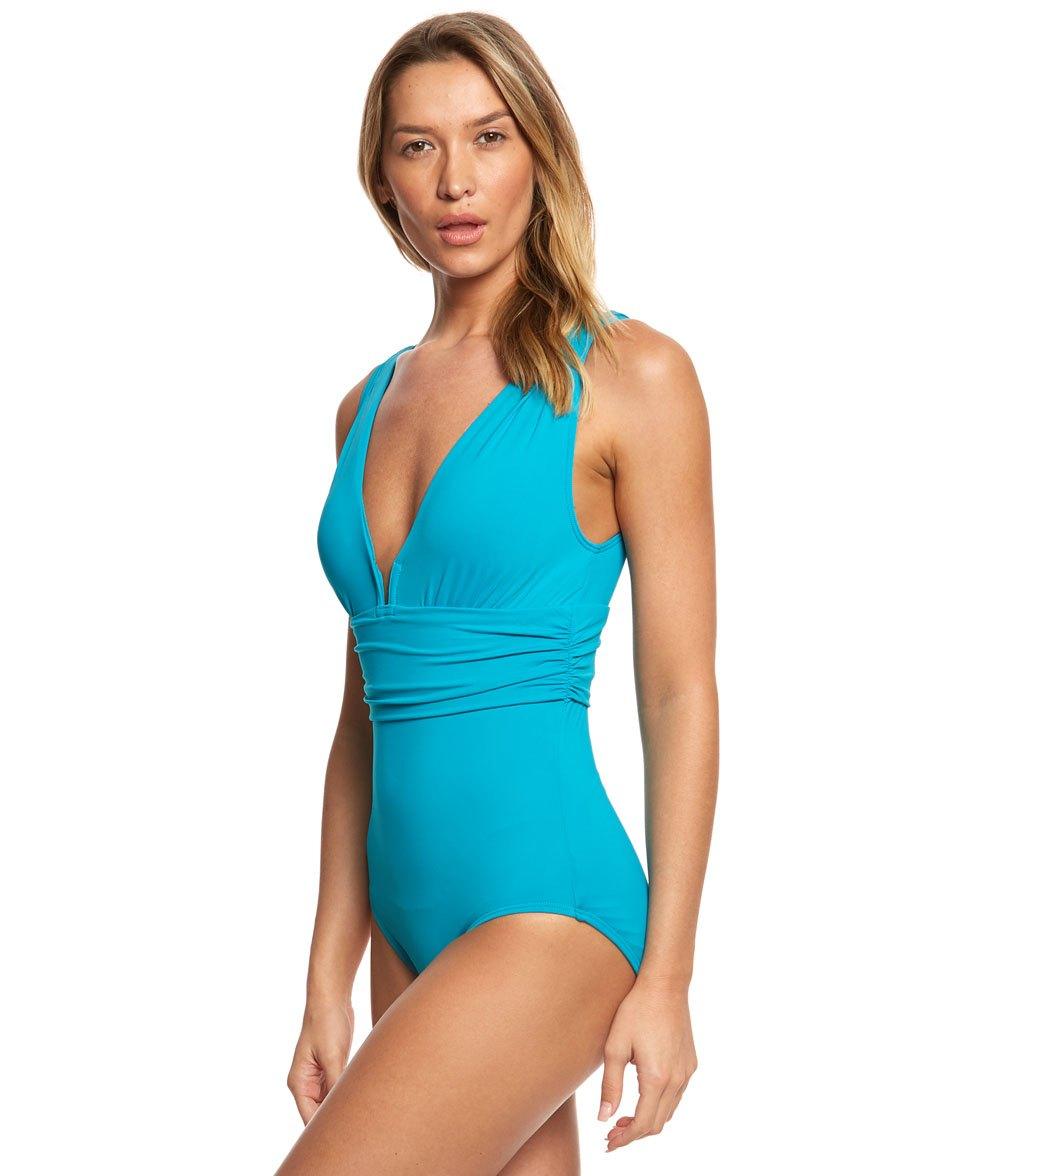 0f9f1c8506bcb Coco Reef Contours Keepsake Emerald Cut One Piece Swimsuit (B/C Cup ...